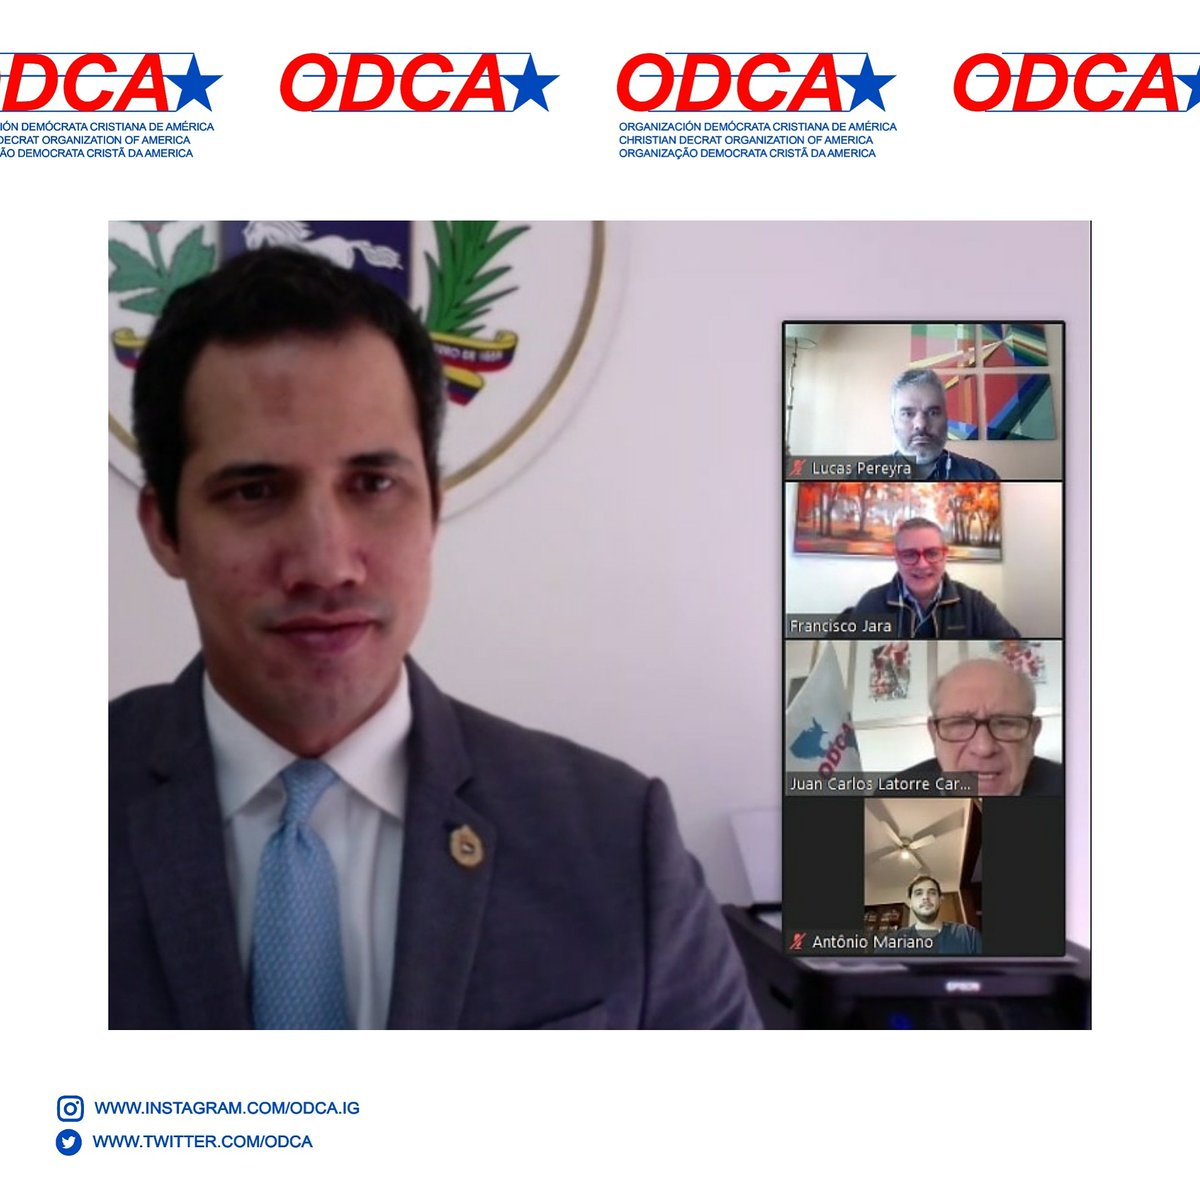 ODCA DEMANDA LA INTERVENCIÓN DE LA CORTE PENAL INTERNACIONAL PARA PERSEGUIR CRIMENES DE LESA HUMANIDAD EN #VENEZUELA   https://t.co/nuCCSHVEaG  @jguaido @Presidencia_VE @AsambleaVE @ODCA @ONU_es @OEA_oficial @Almagro_OEA2015 @mbachelet @IntlCrimCourt #CPI https://t.co/YmKmAoeo87